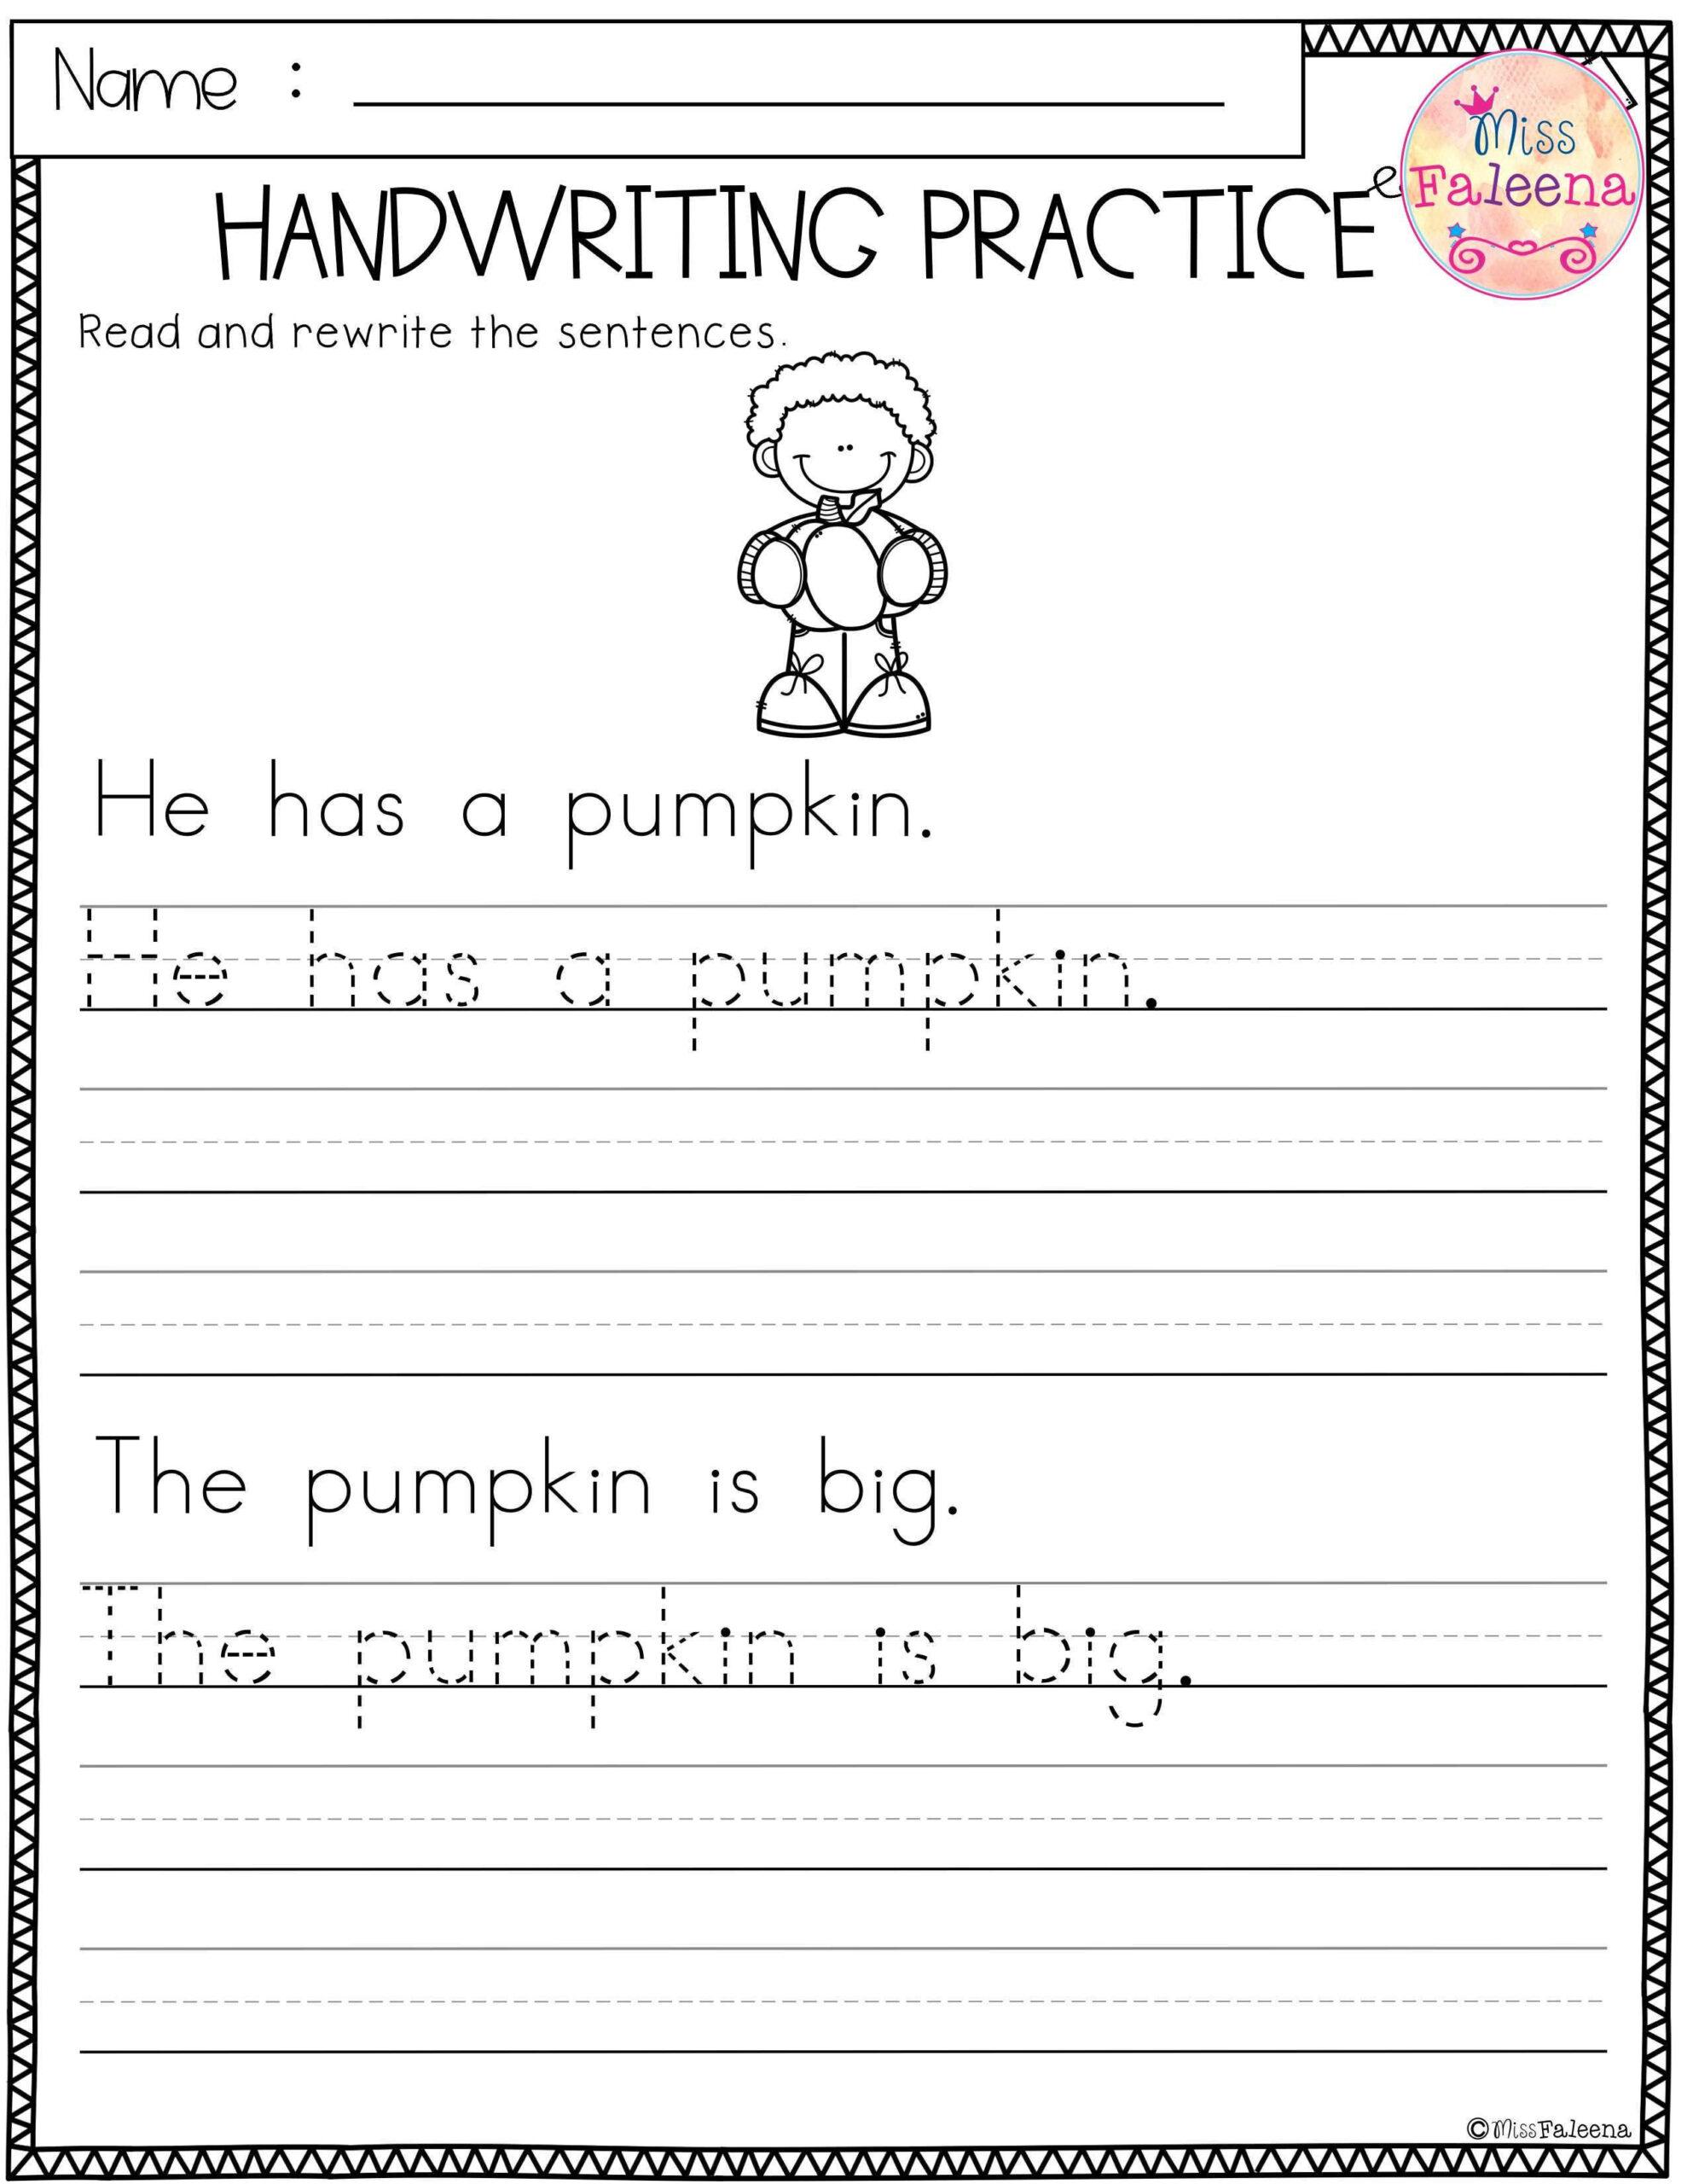 Free Handwriting Practice | Writing Practice Worksheets